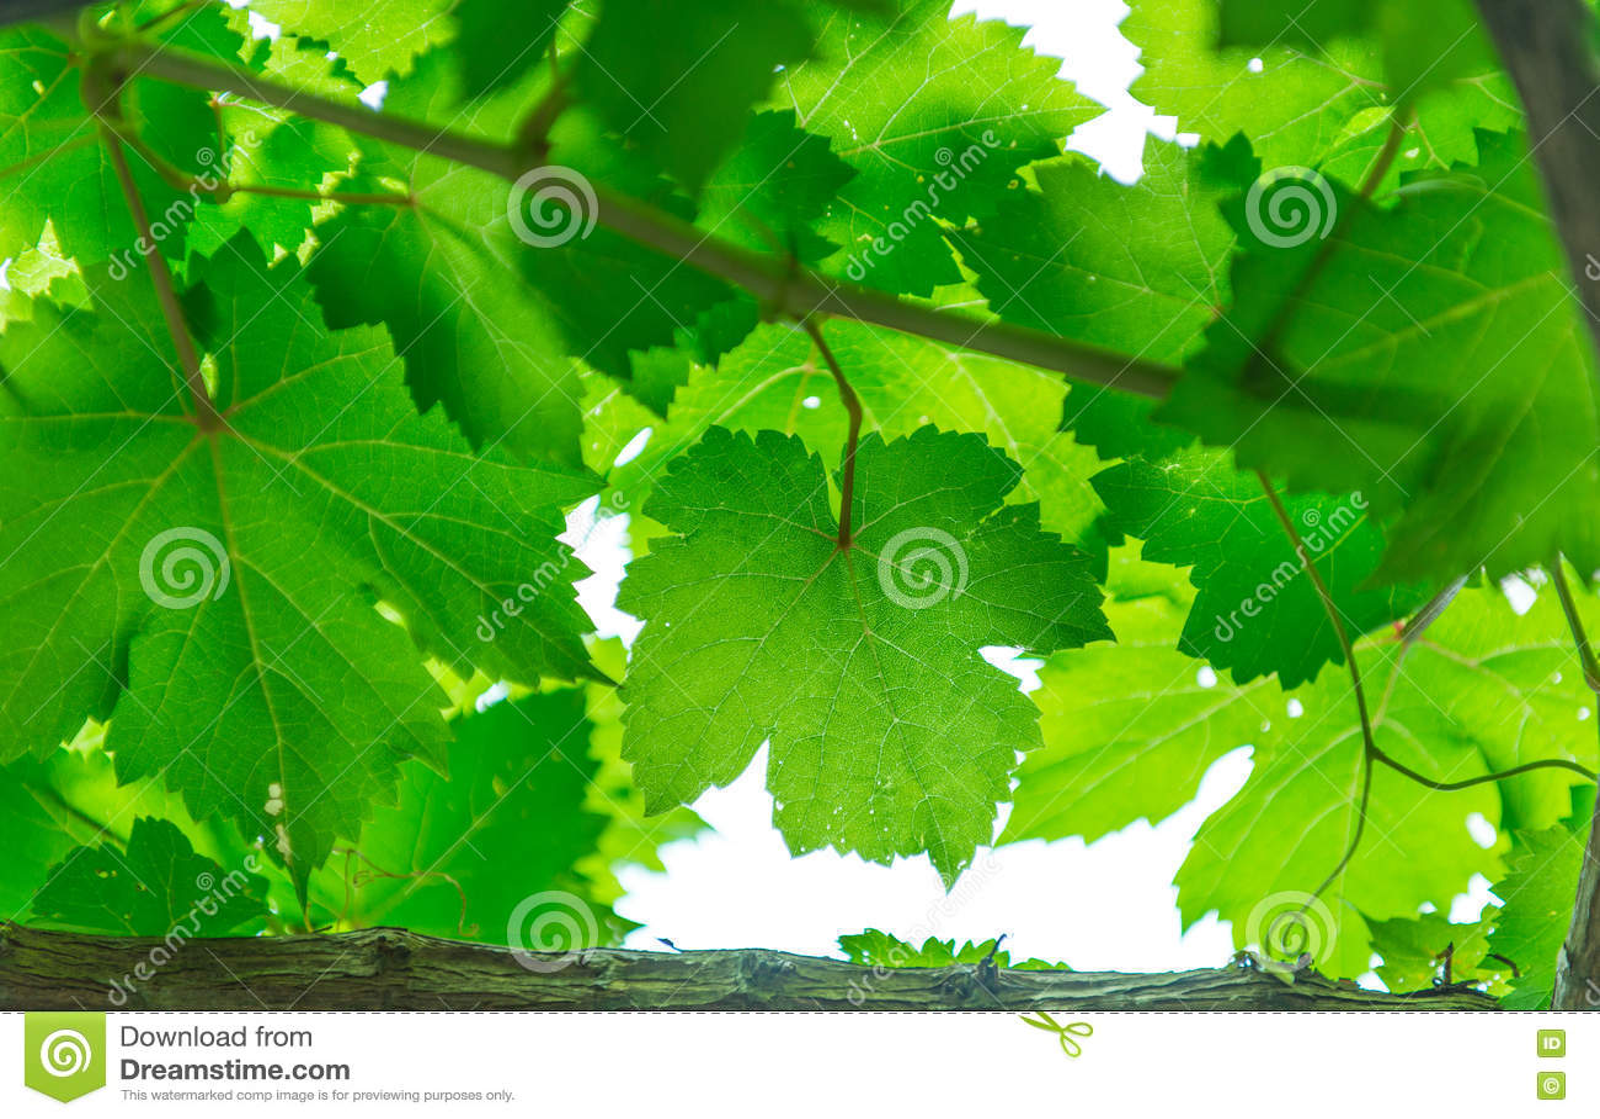 Download Grape leaf stock photo. Image of growth, sunshine, beautiful - 70398584